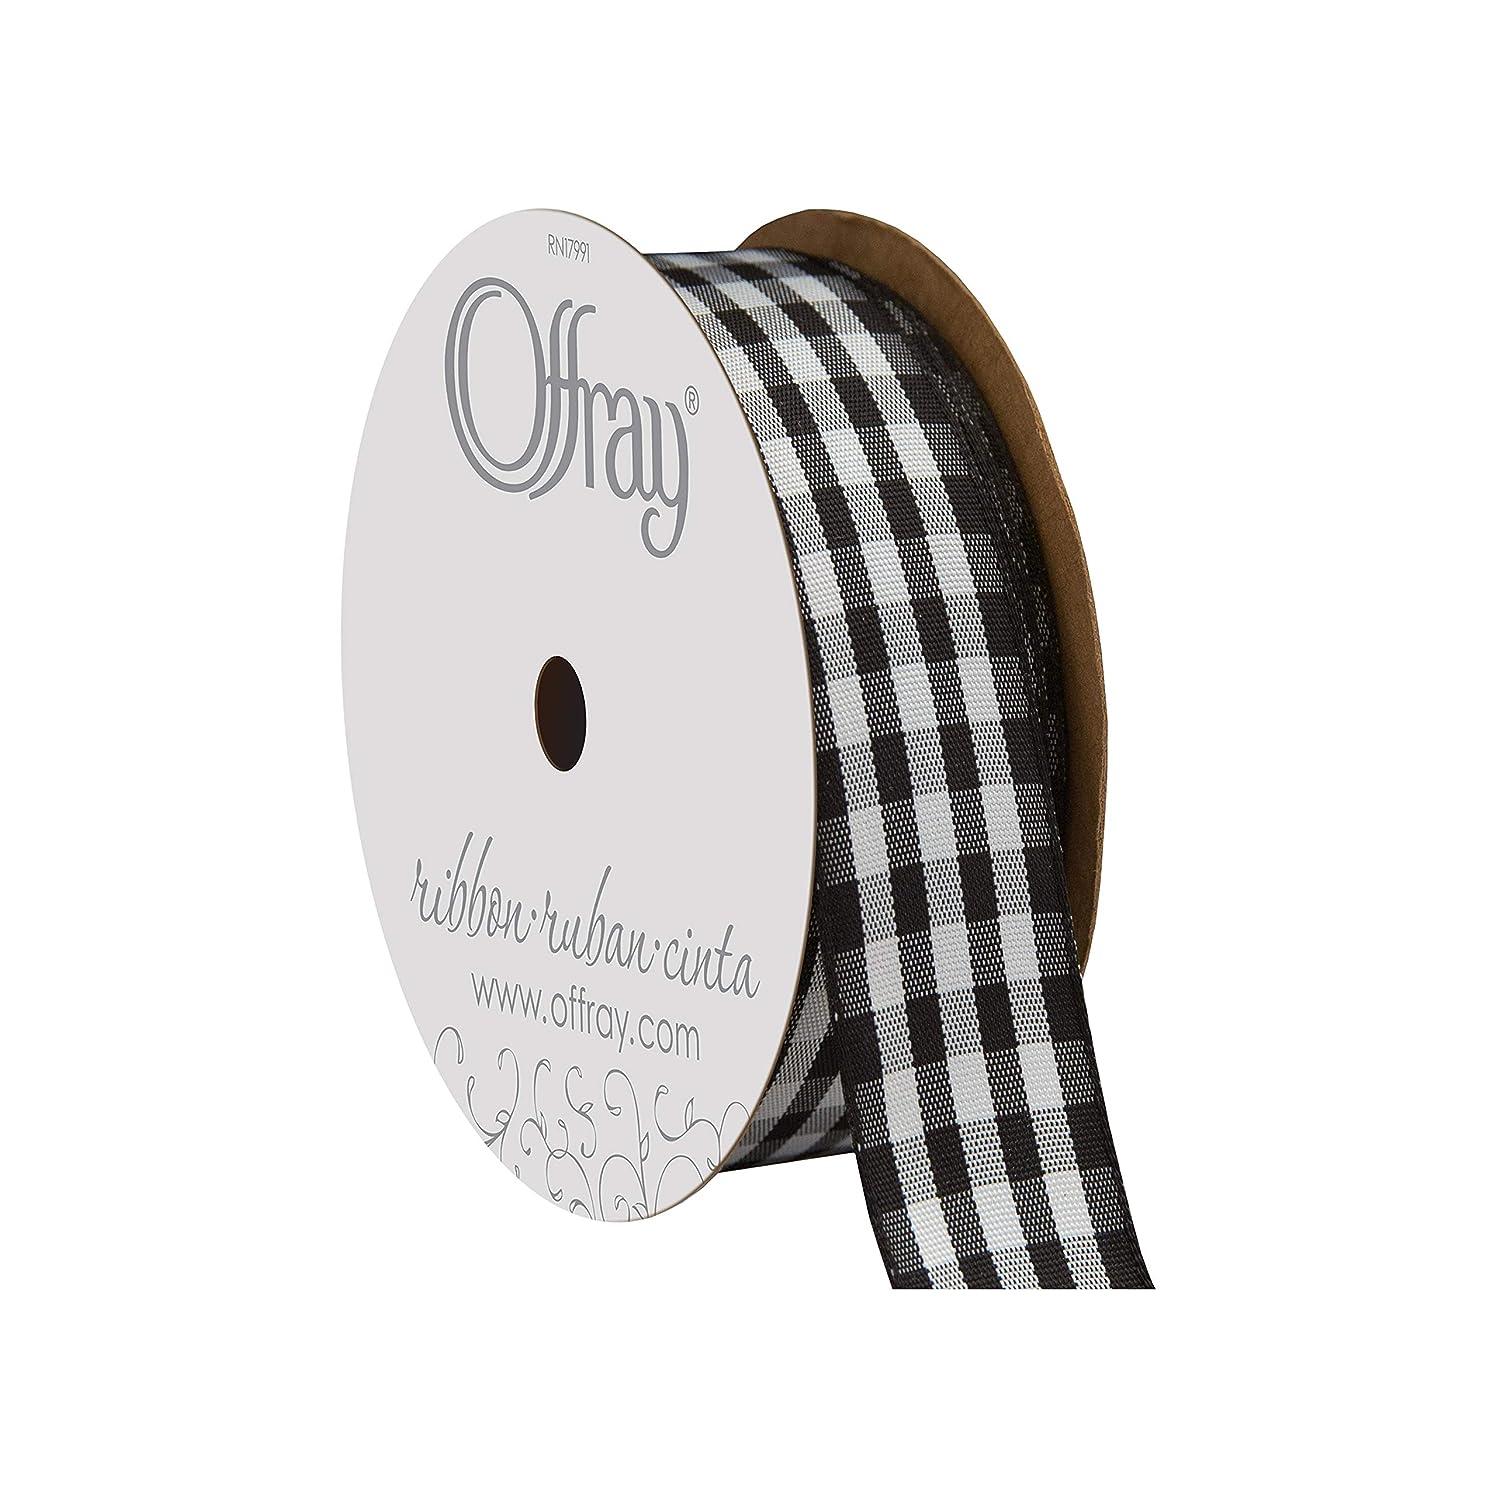 Offray Taffeta Gingham Check Craft Ribbon, 7/8-Inch x 9-Feet, Black